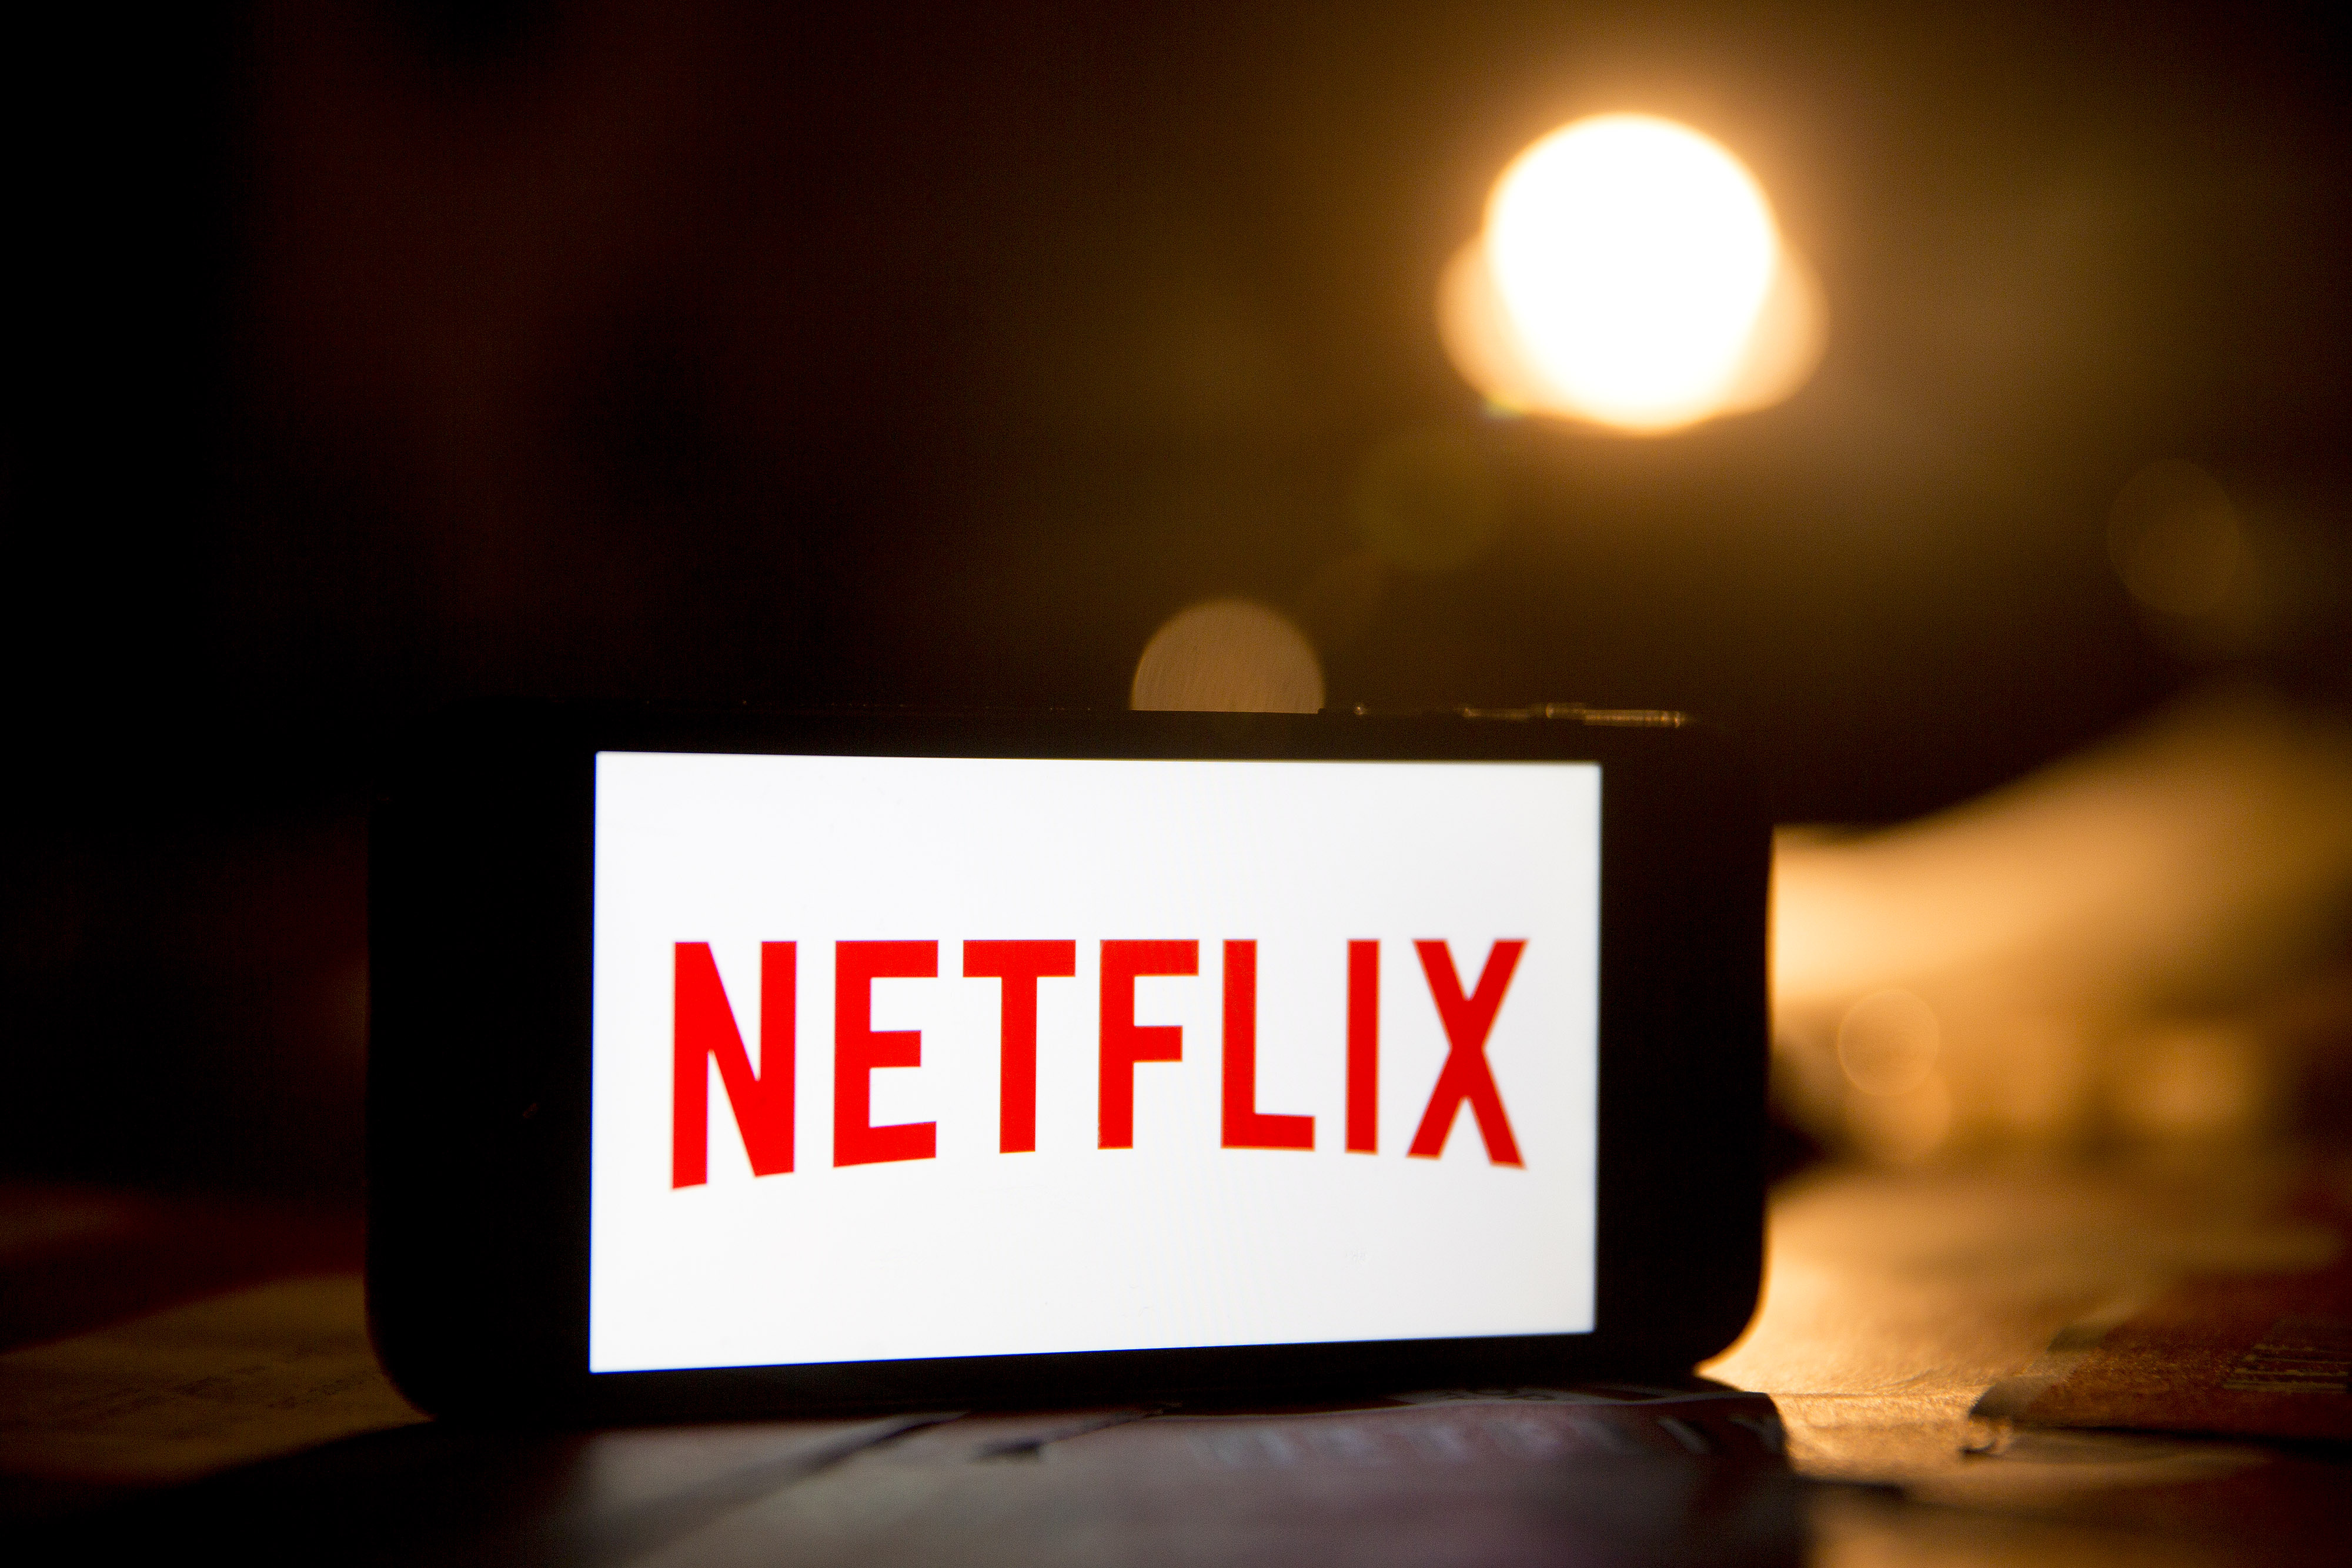 Netflix — Most Admired 2016